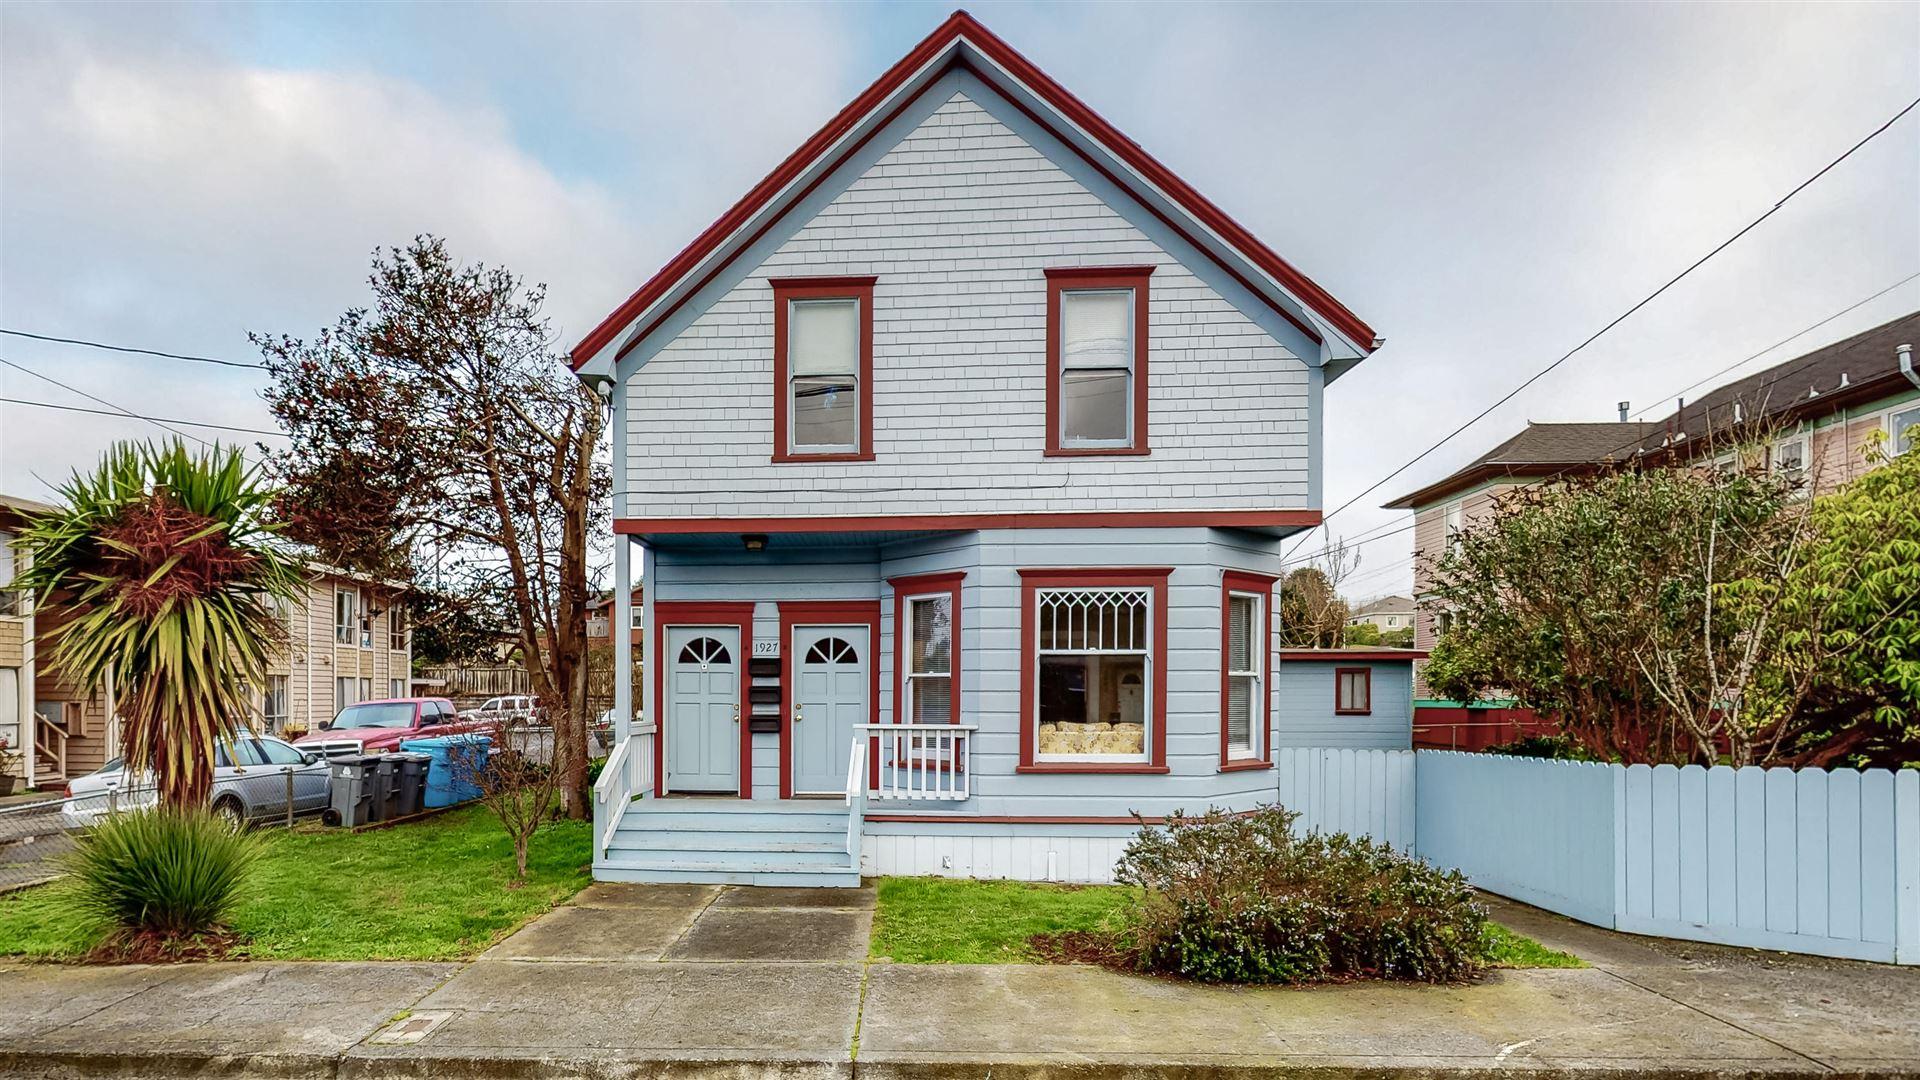 1927 C Street, Eureka, CA 95501 - MLS#: 258139